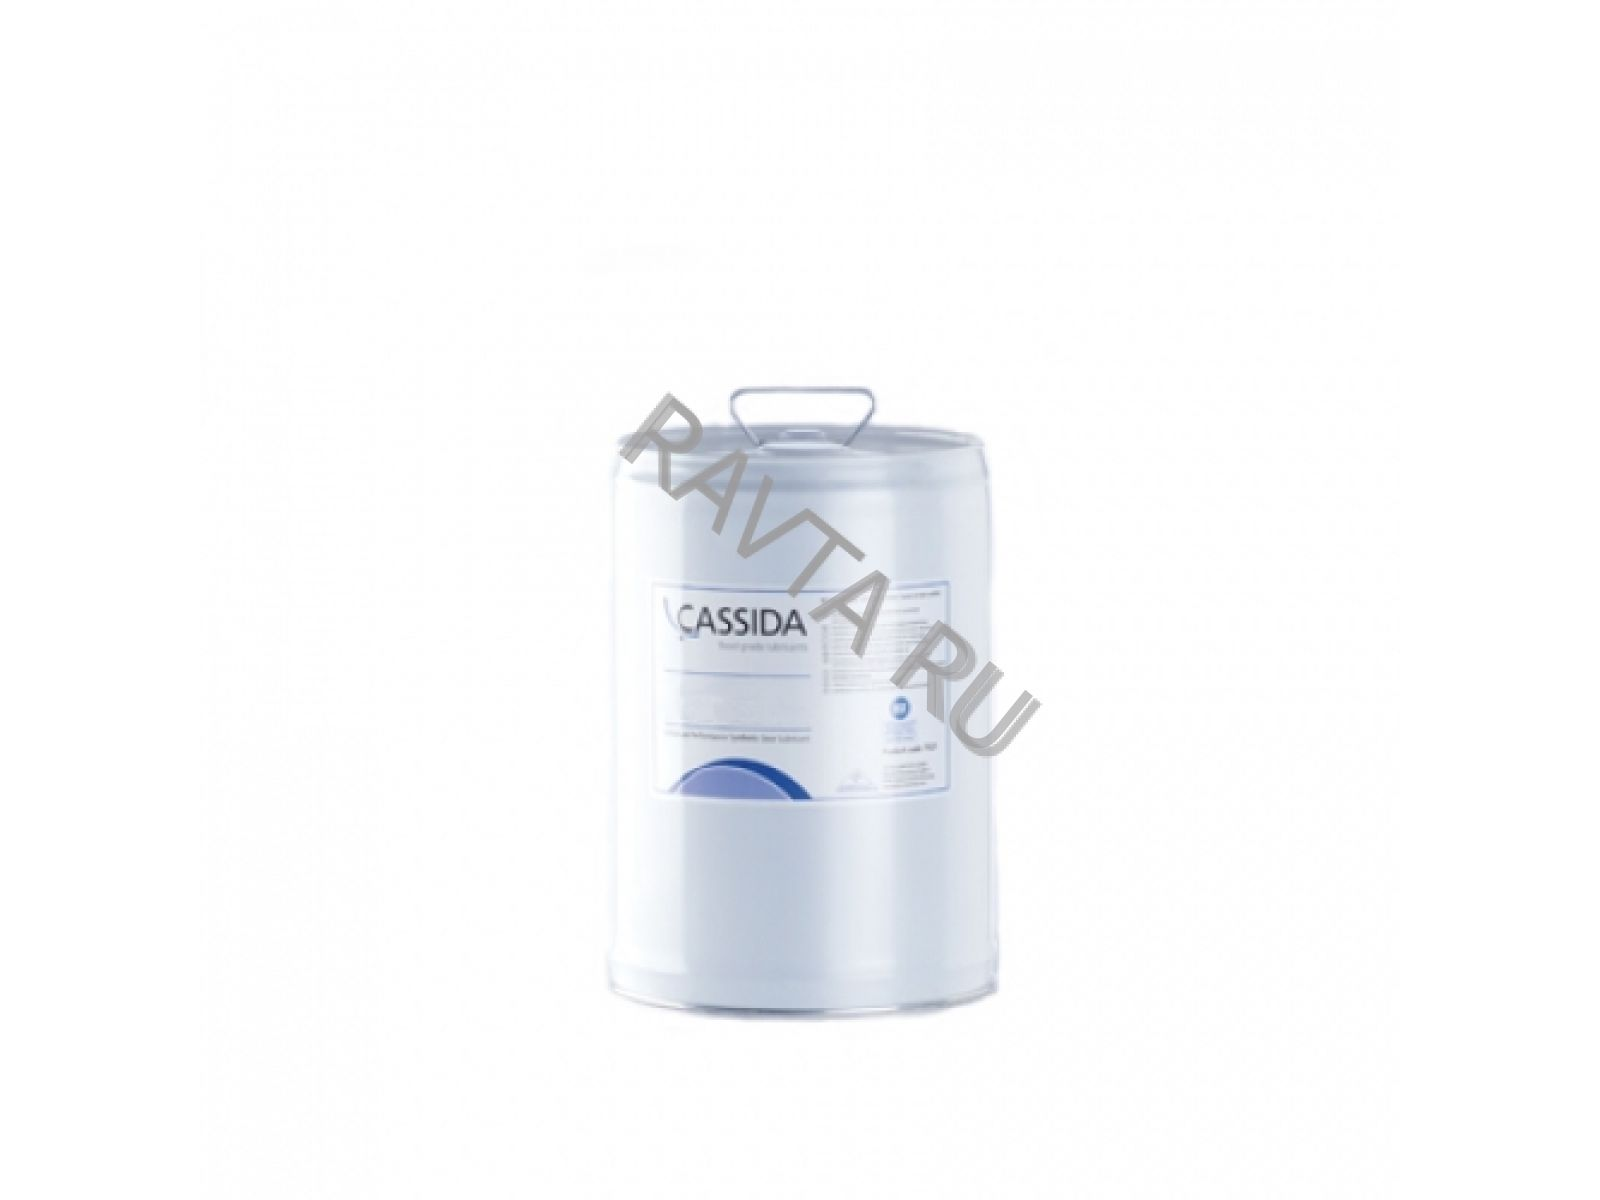 Масло для цепей CASSIDA CHAIN OIL 1000 (22л) от Ravta